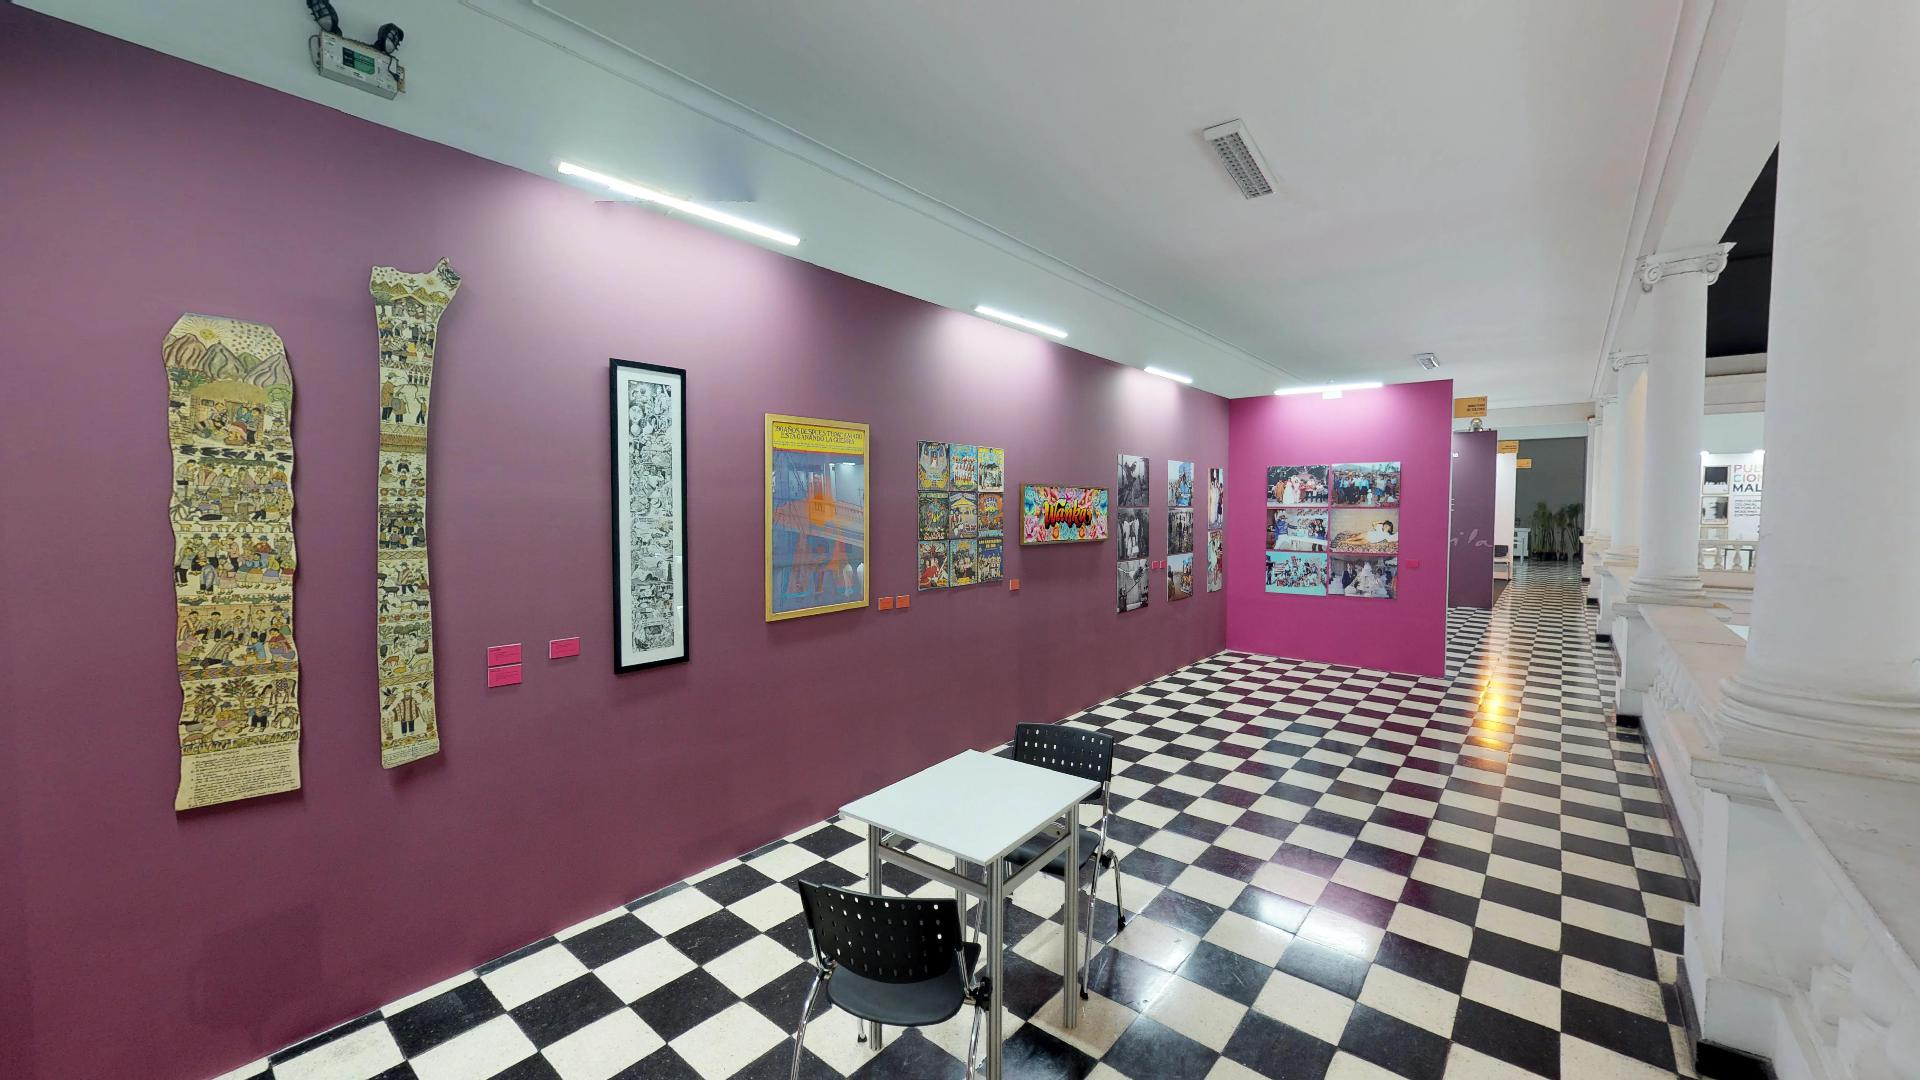 Exhibición Art Lima 2018 Barranco, Lima, Perú